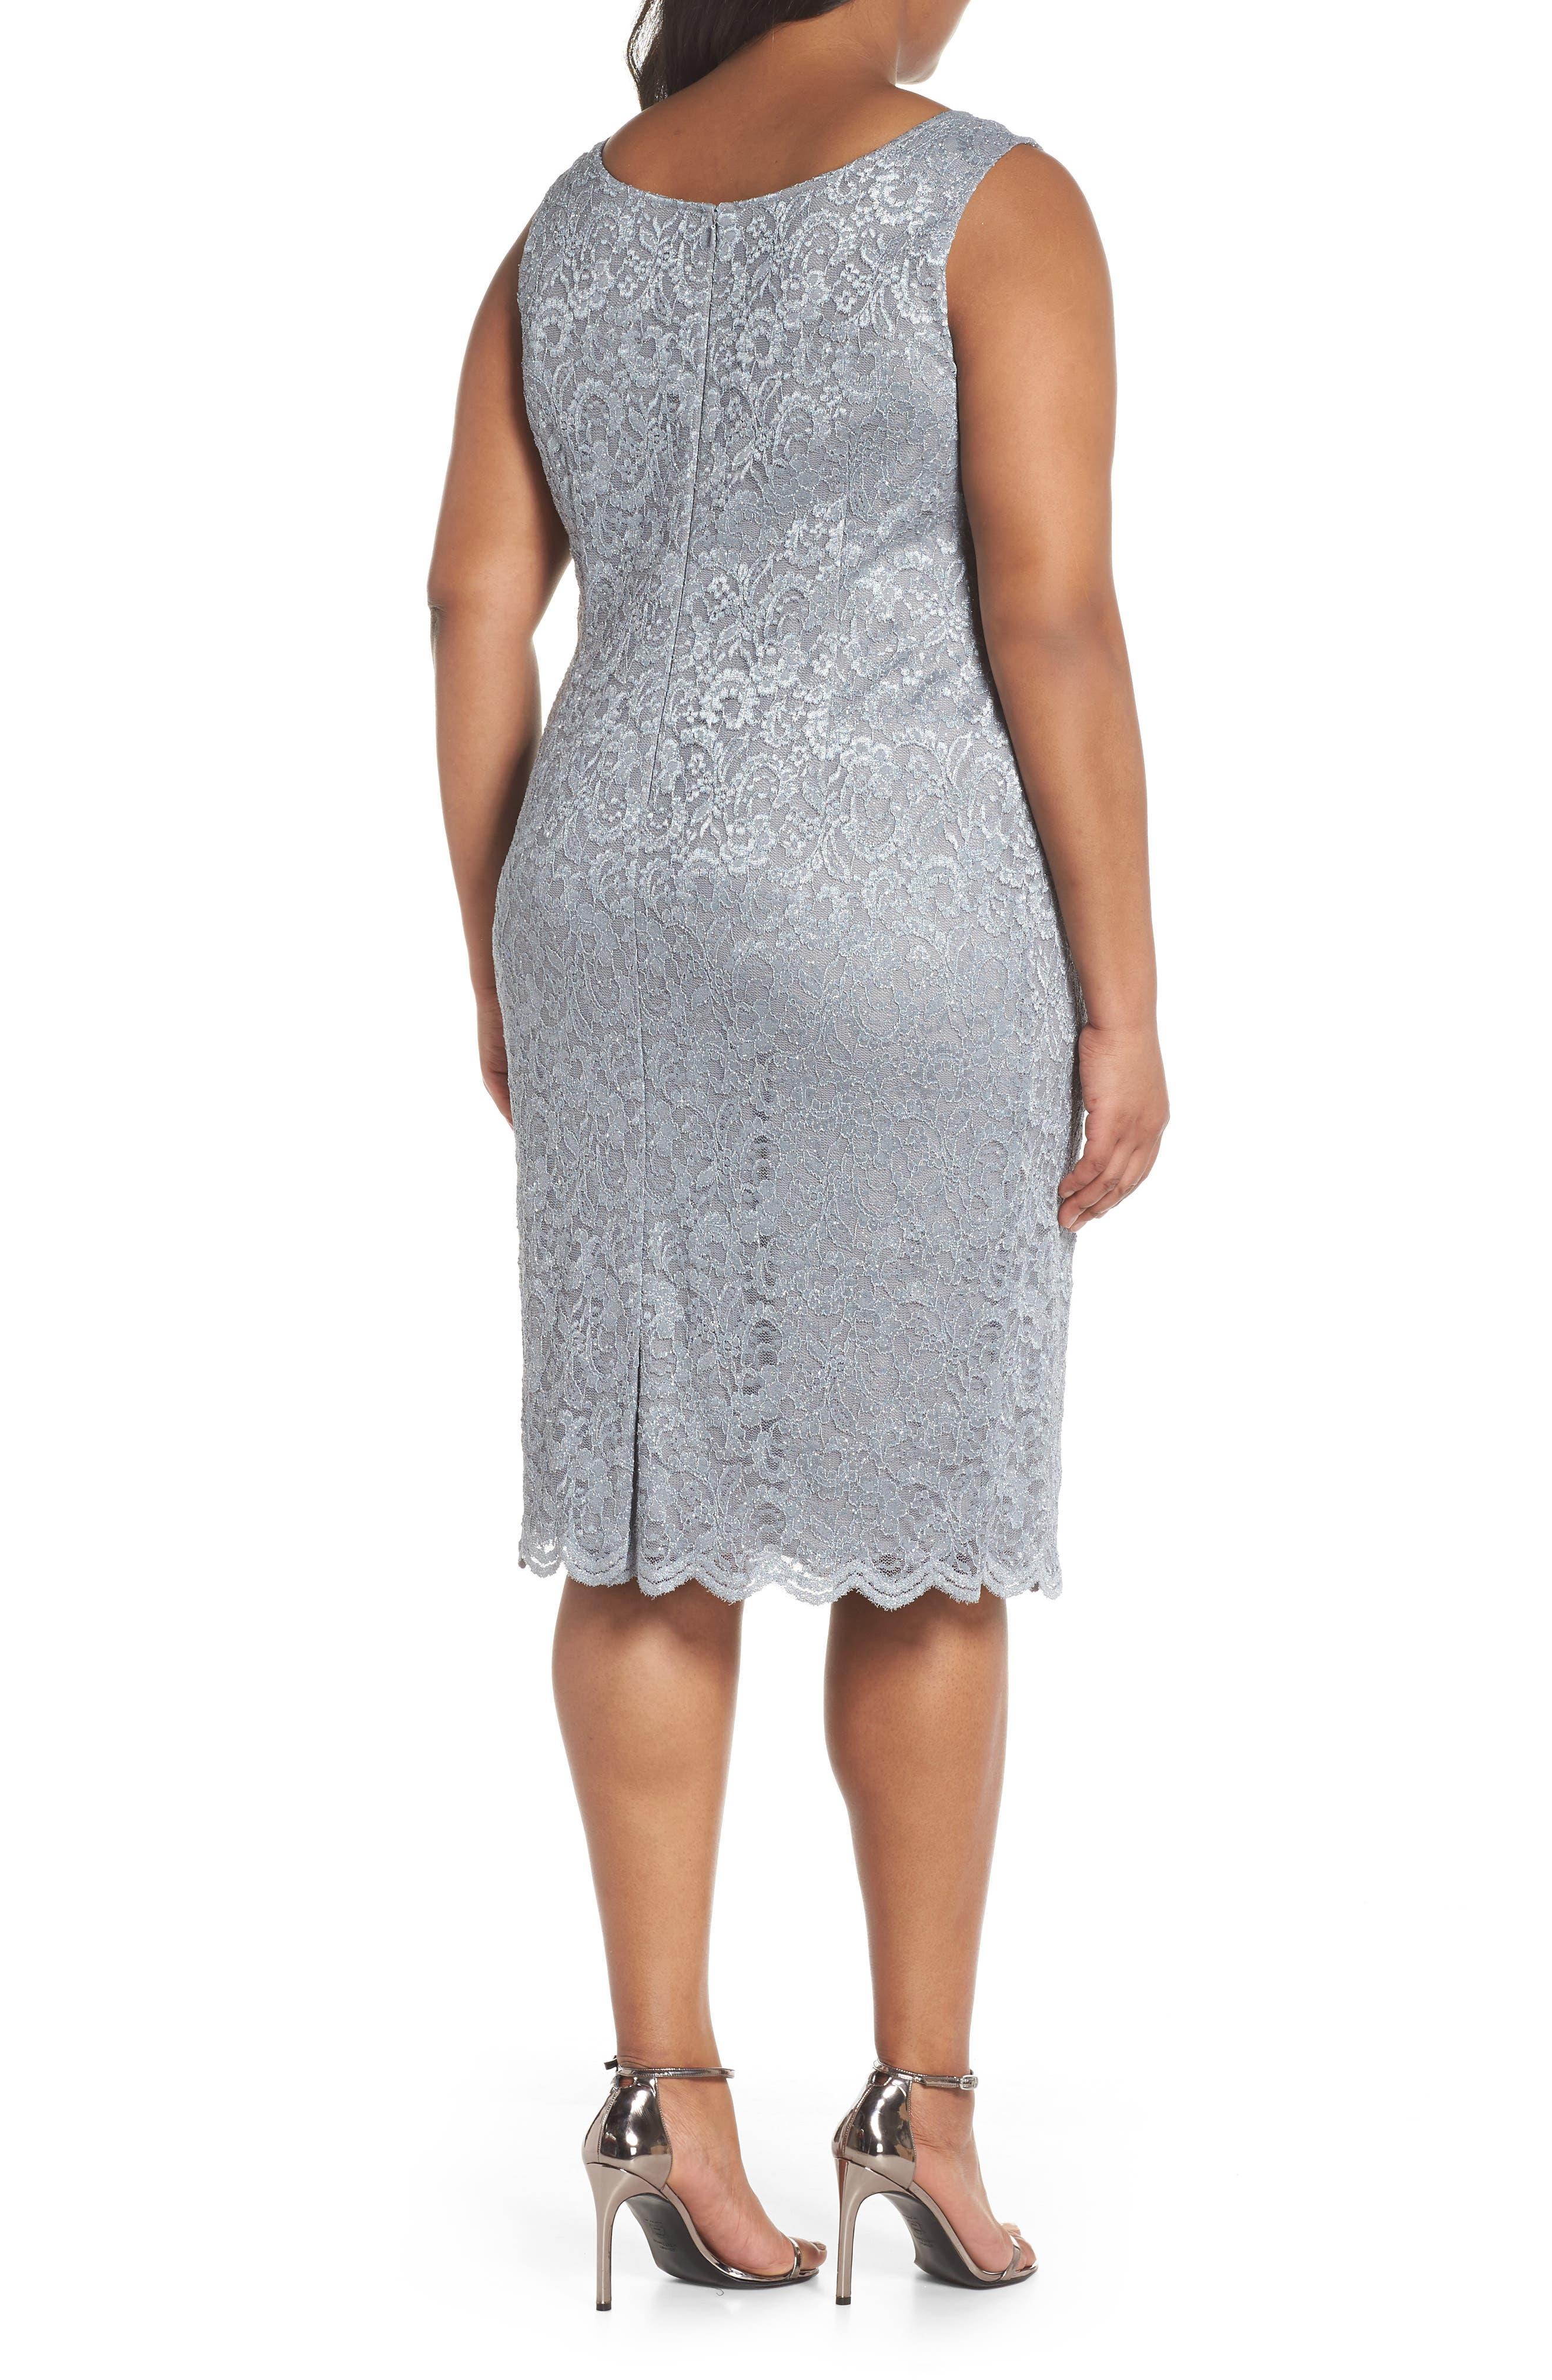 Lace Sheath Dress with Bolero Jacket,                             Alternate thumbnail 4, color,                             Silver